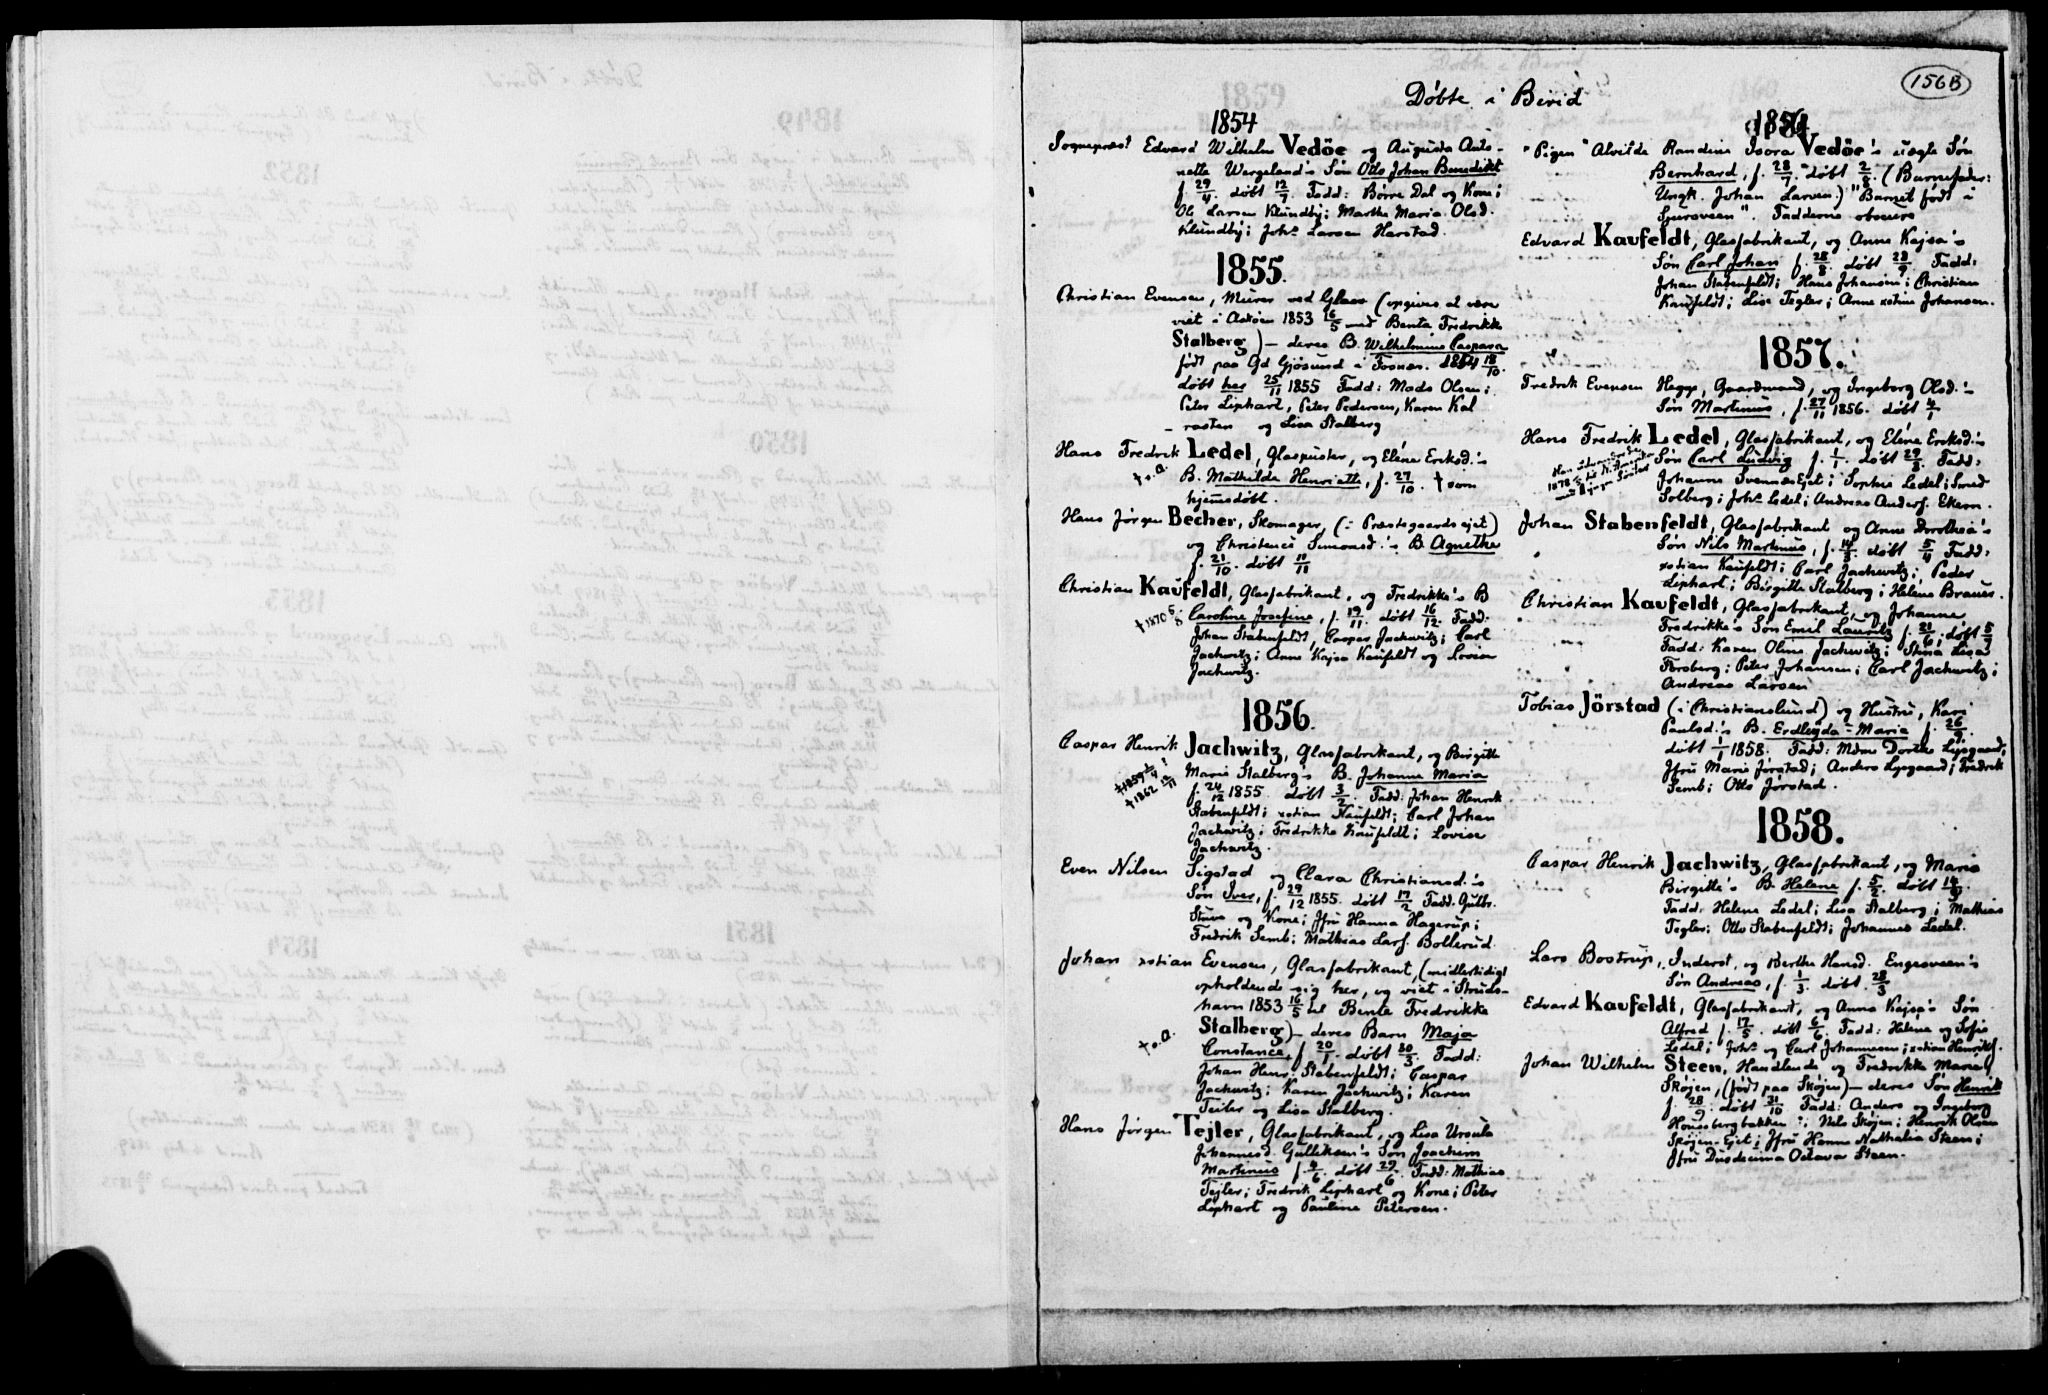 SAH, Biri prestekontor, Ministerialbok, 1730-1879, s. 156b